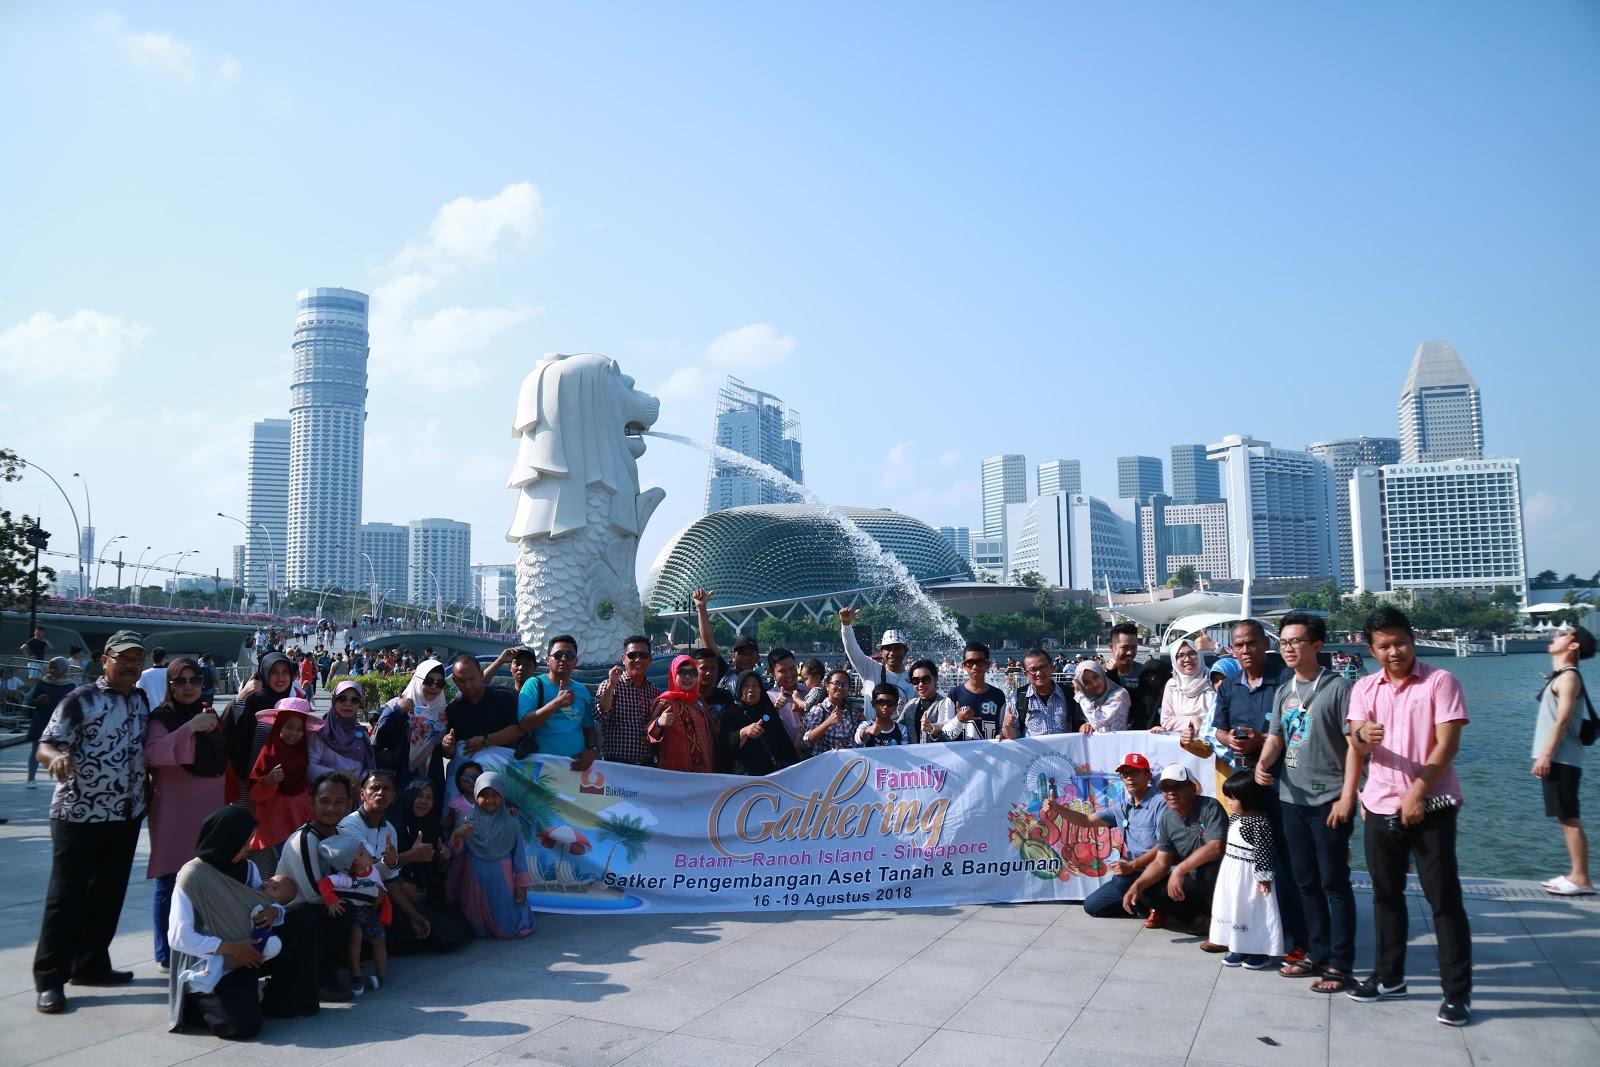 Menjelajah Singapura Dalam 1 Hari Dari Batam Kak Ceng Tour